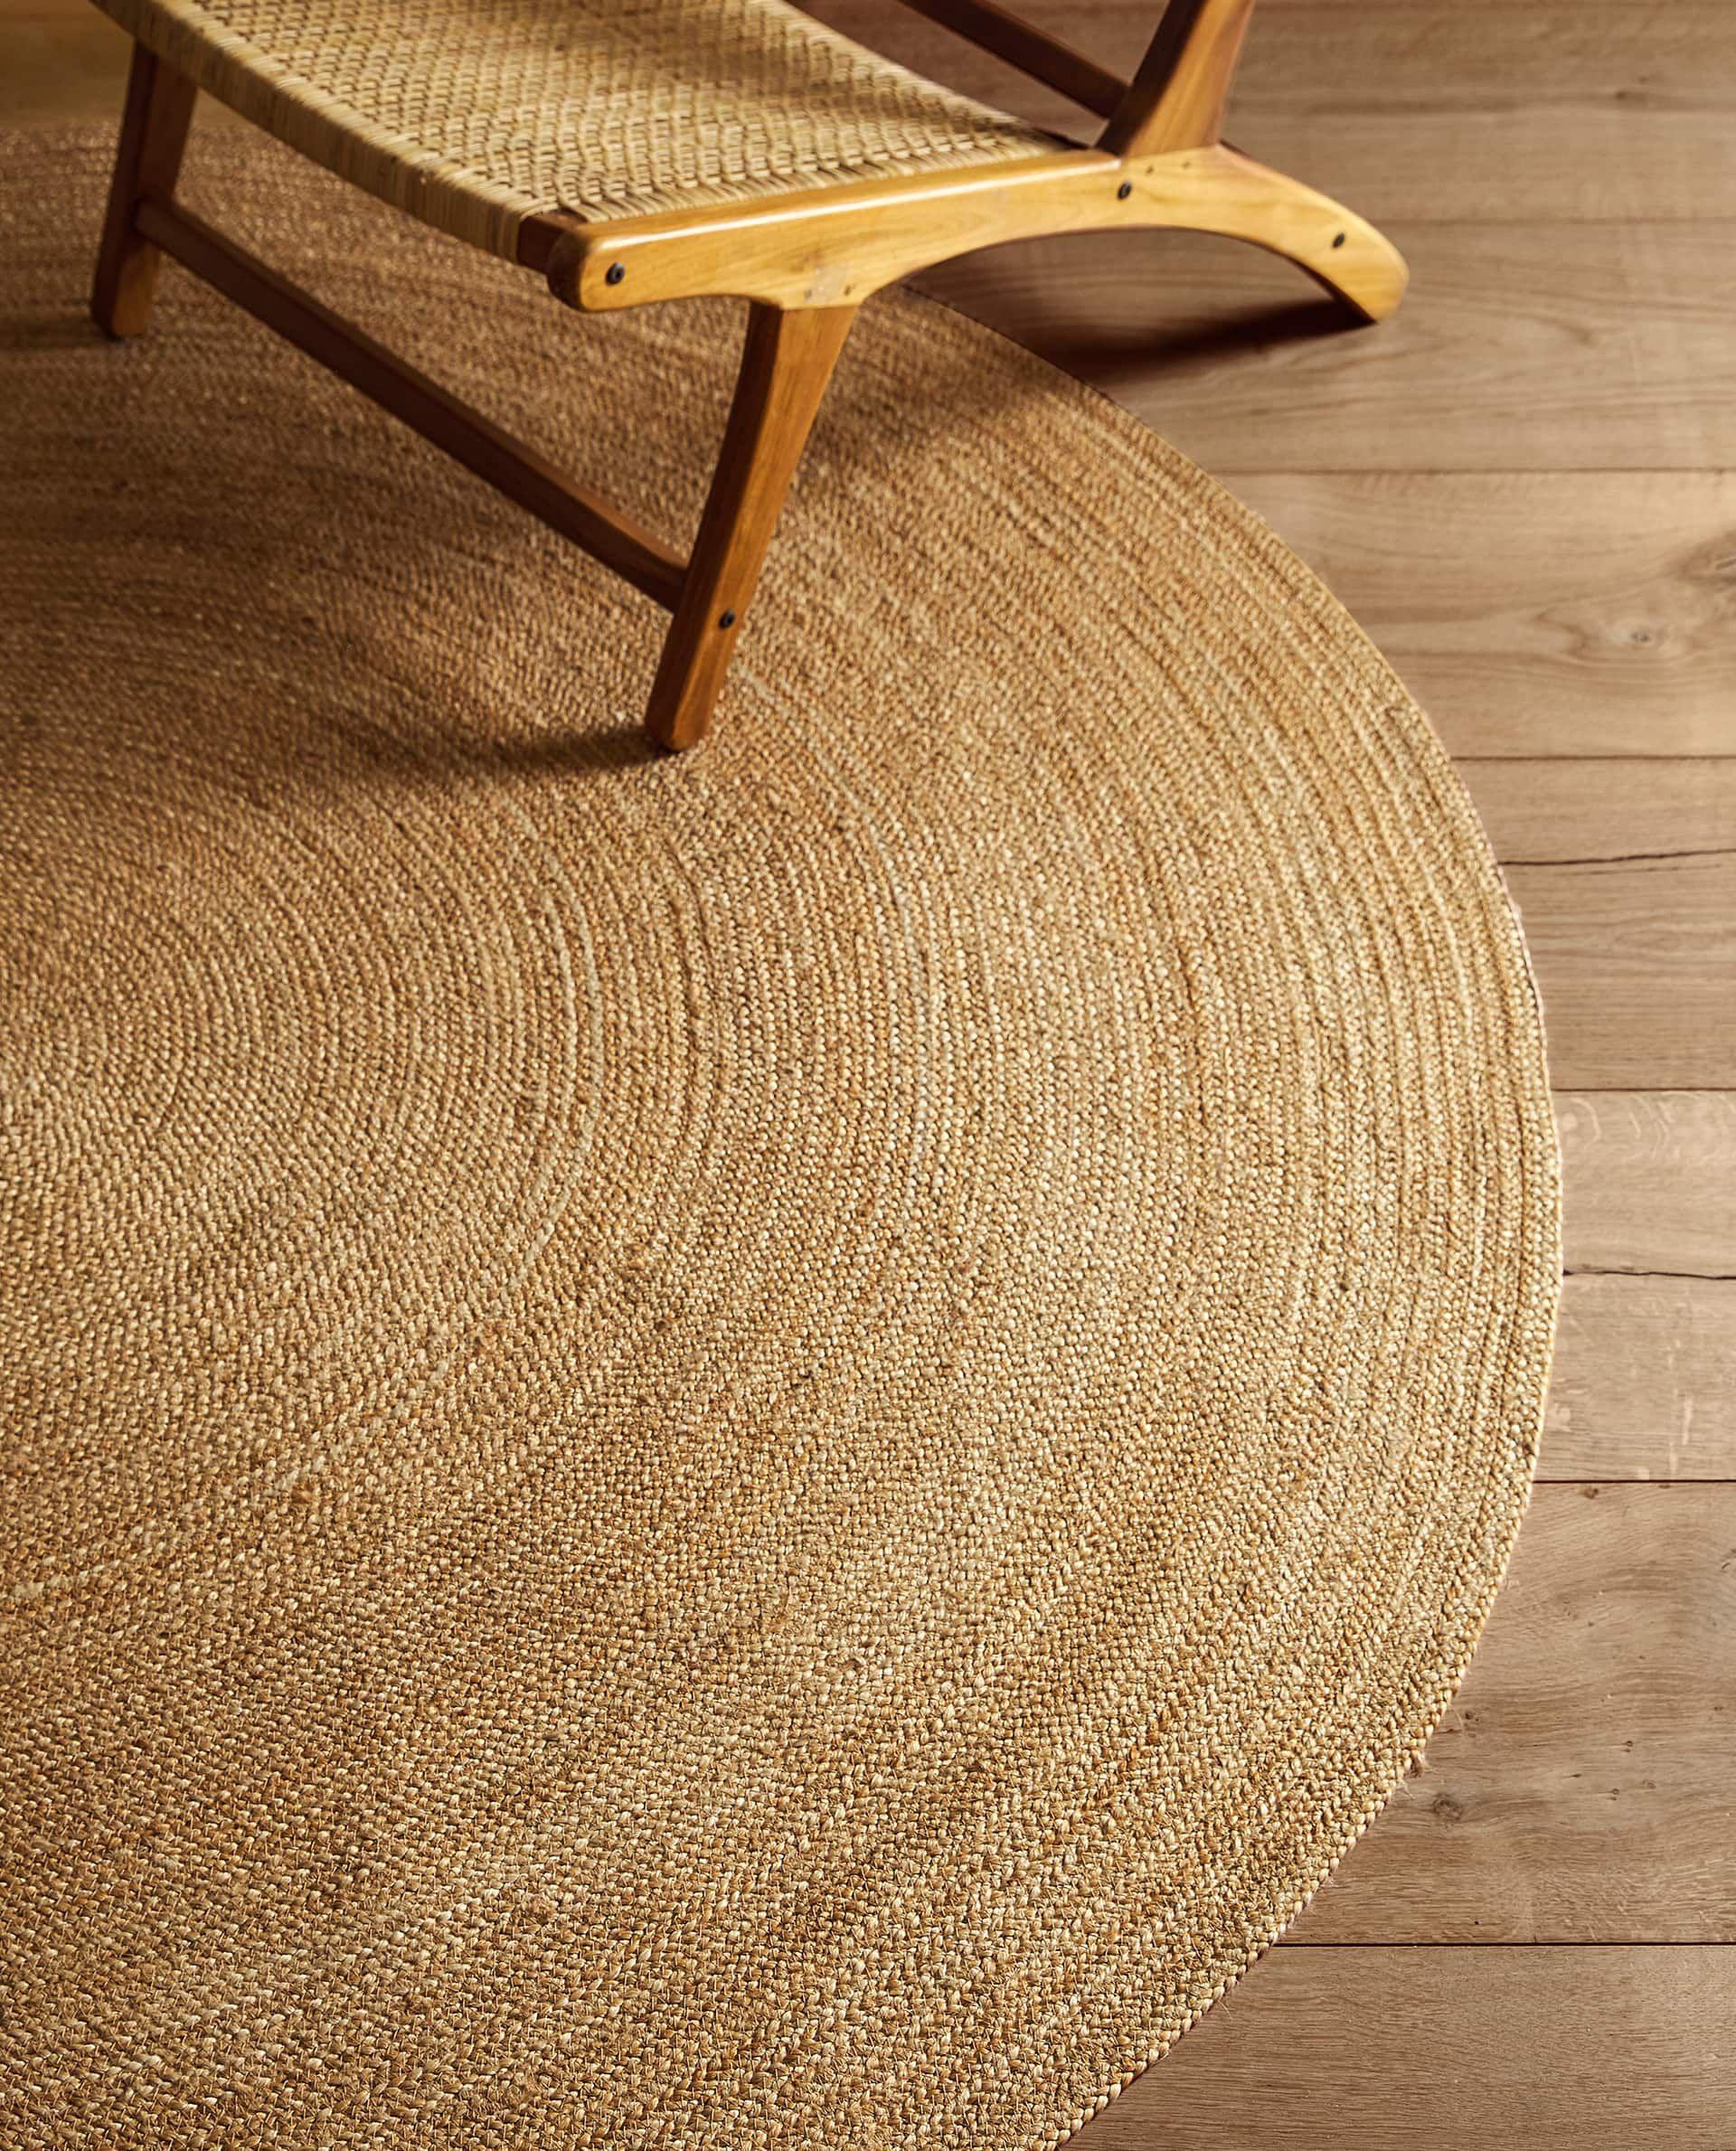 Round Jute Rug Rugs Living Room Zara Home United Kingdom Jute Tapijt Tapijt Tapijt Rond